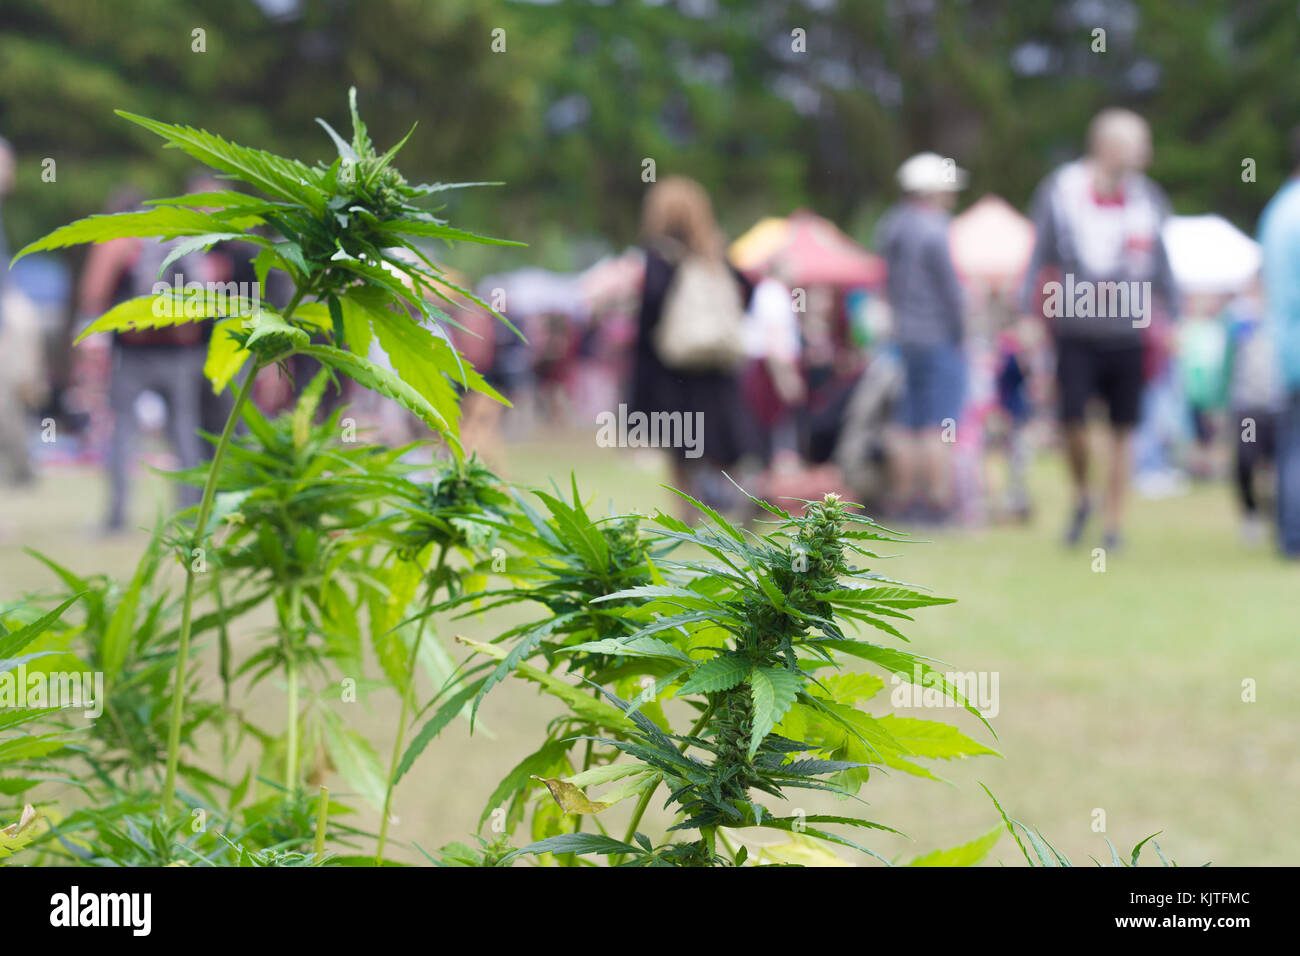 marijuana bush and people - Stock Image